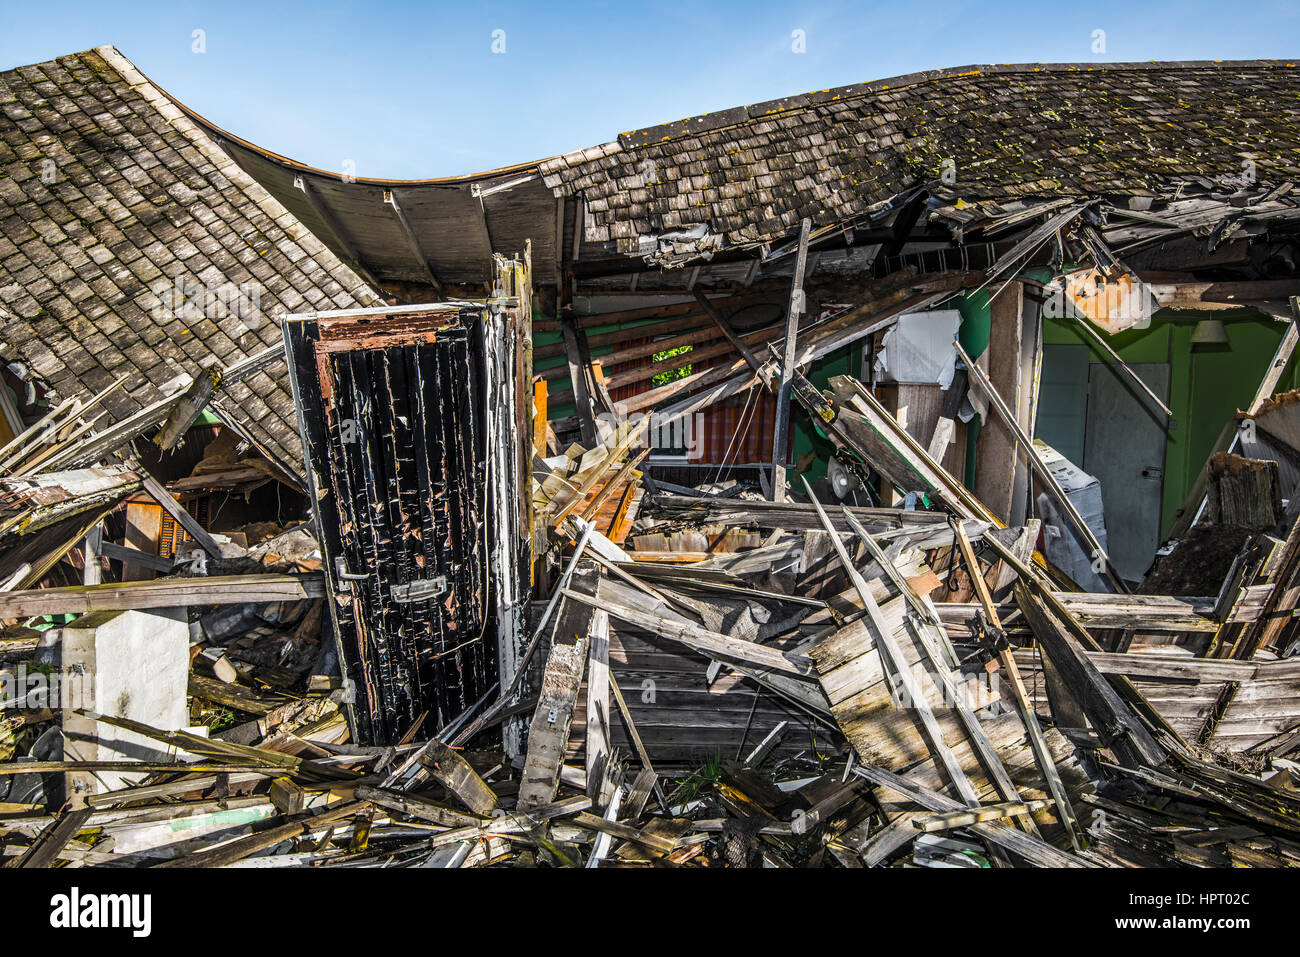 A demolished building - Stock Image